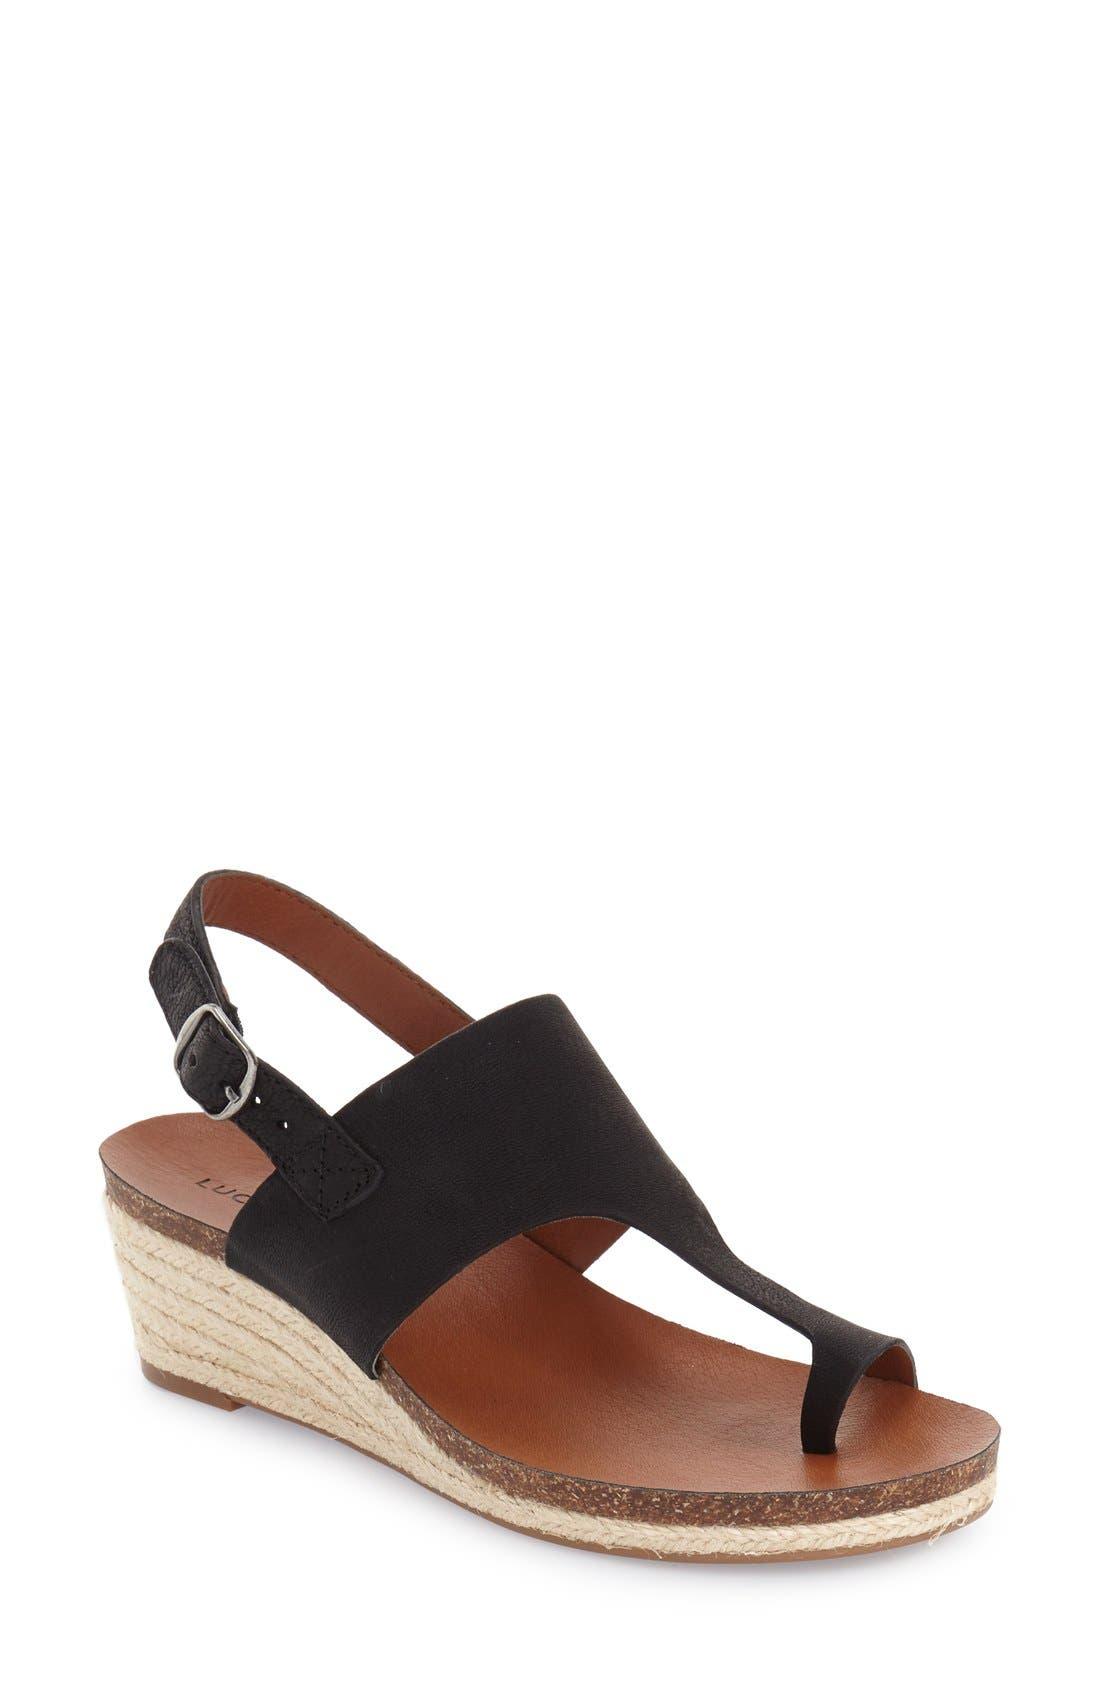 Alternate Image 1 Selected - Lucky Brand 'Janessa' Espadrille Wedge Sandal (Women)